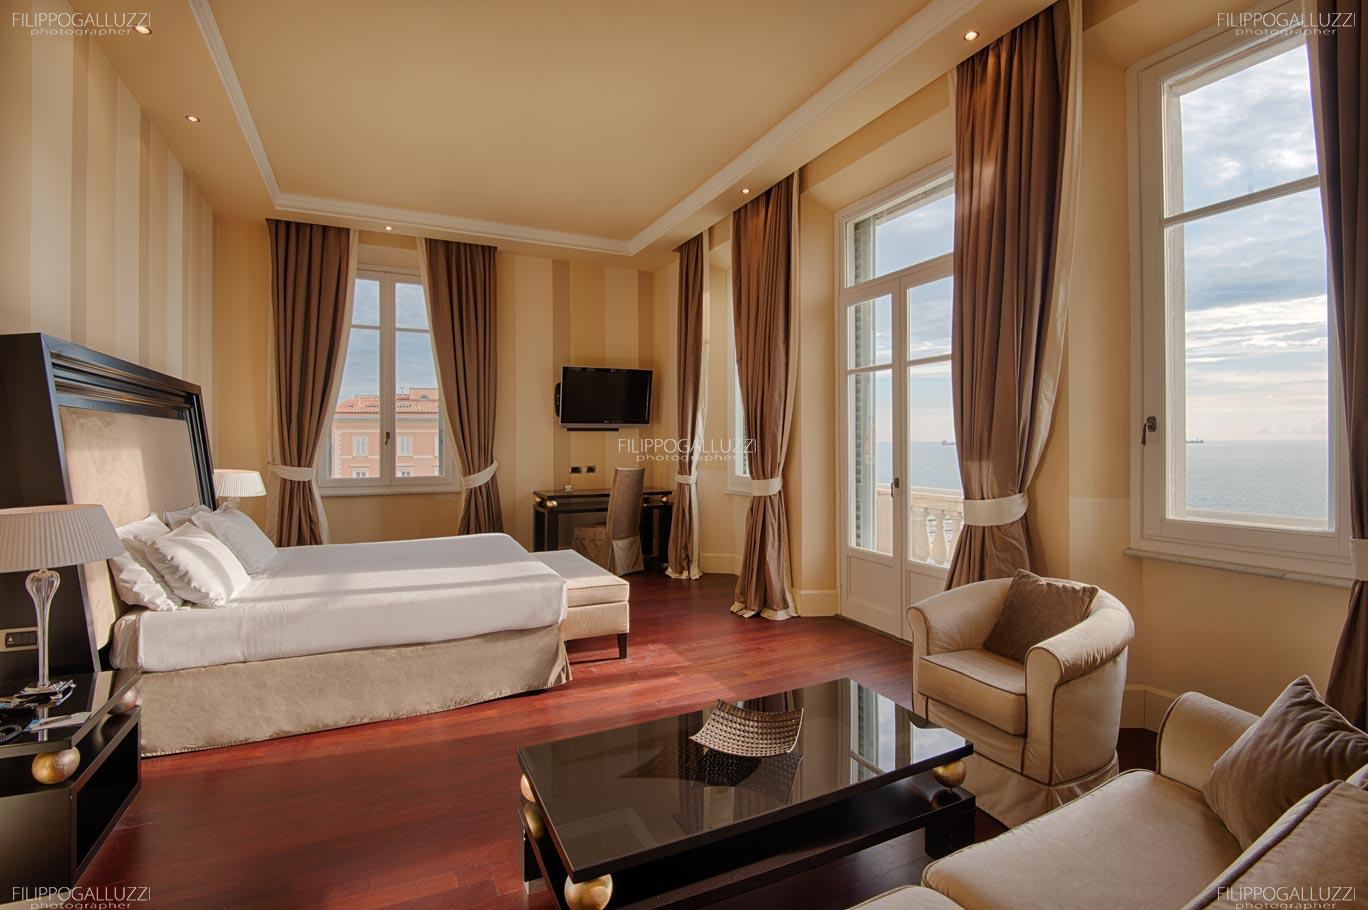 Toscana, Livorno, Hotel Gran Palazzo *****